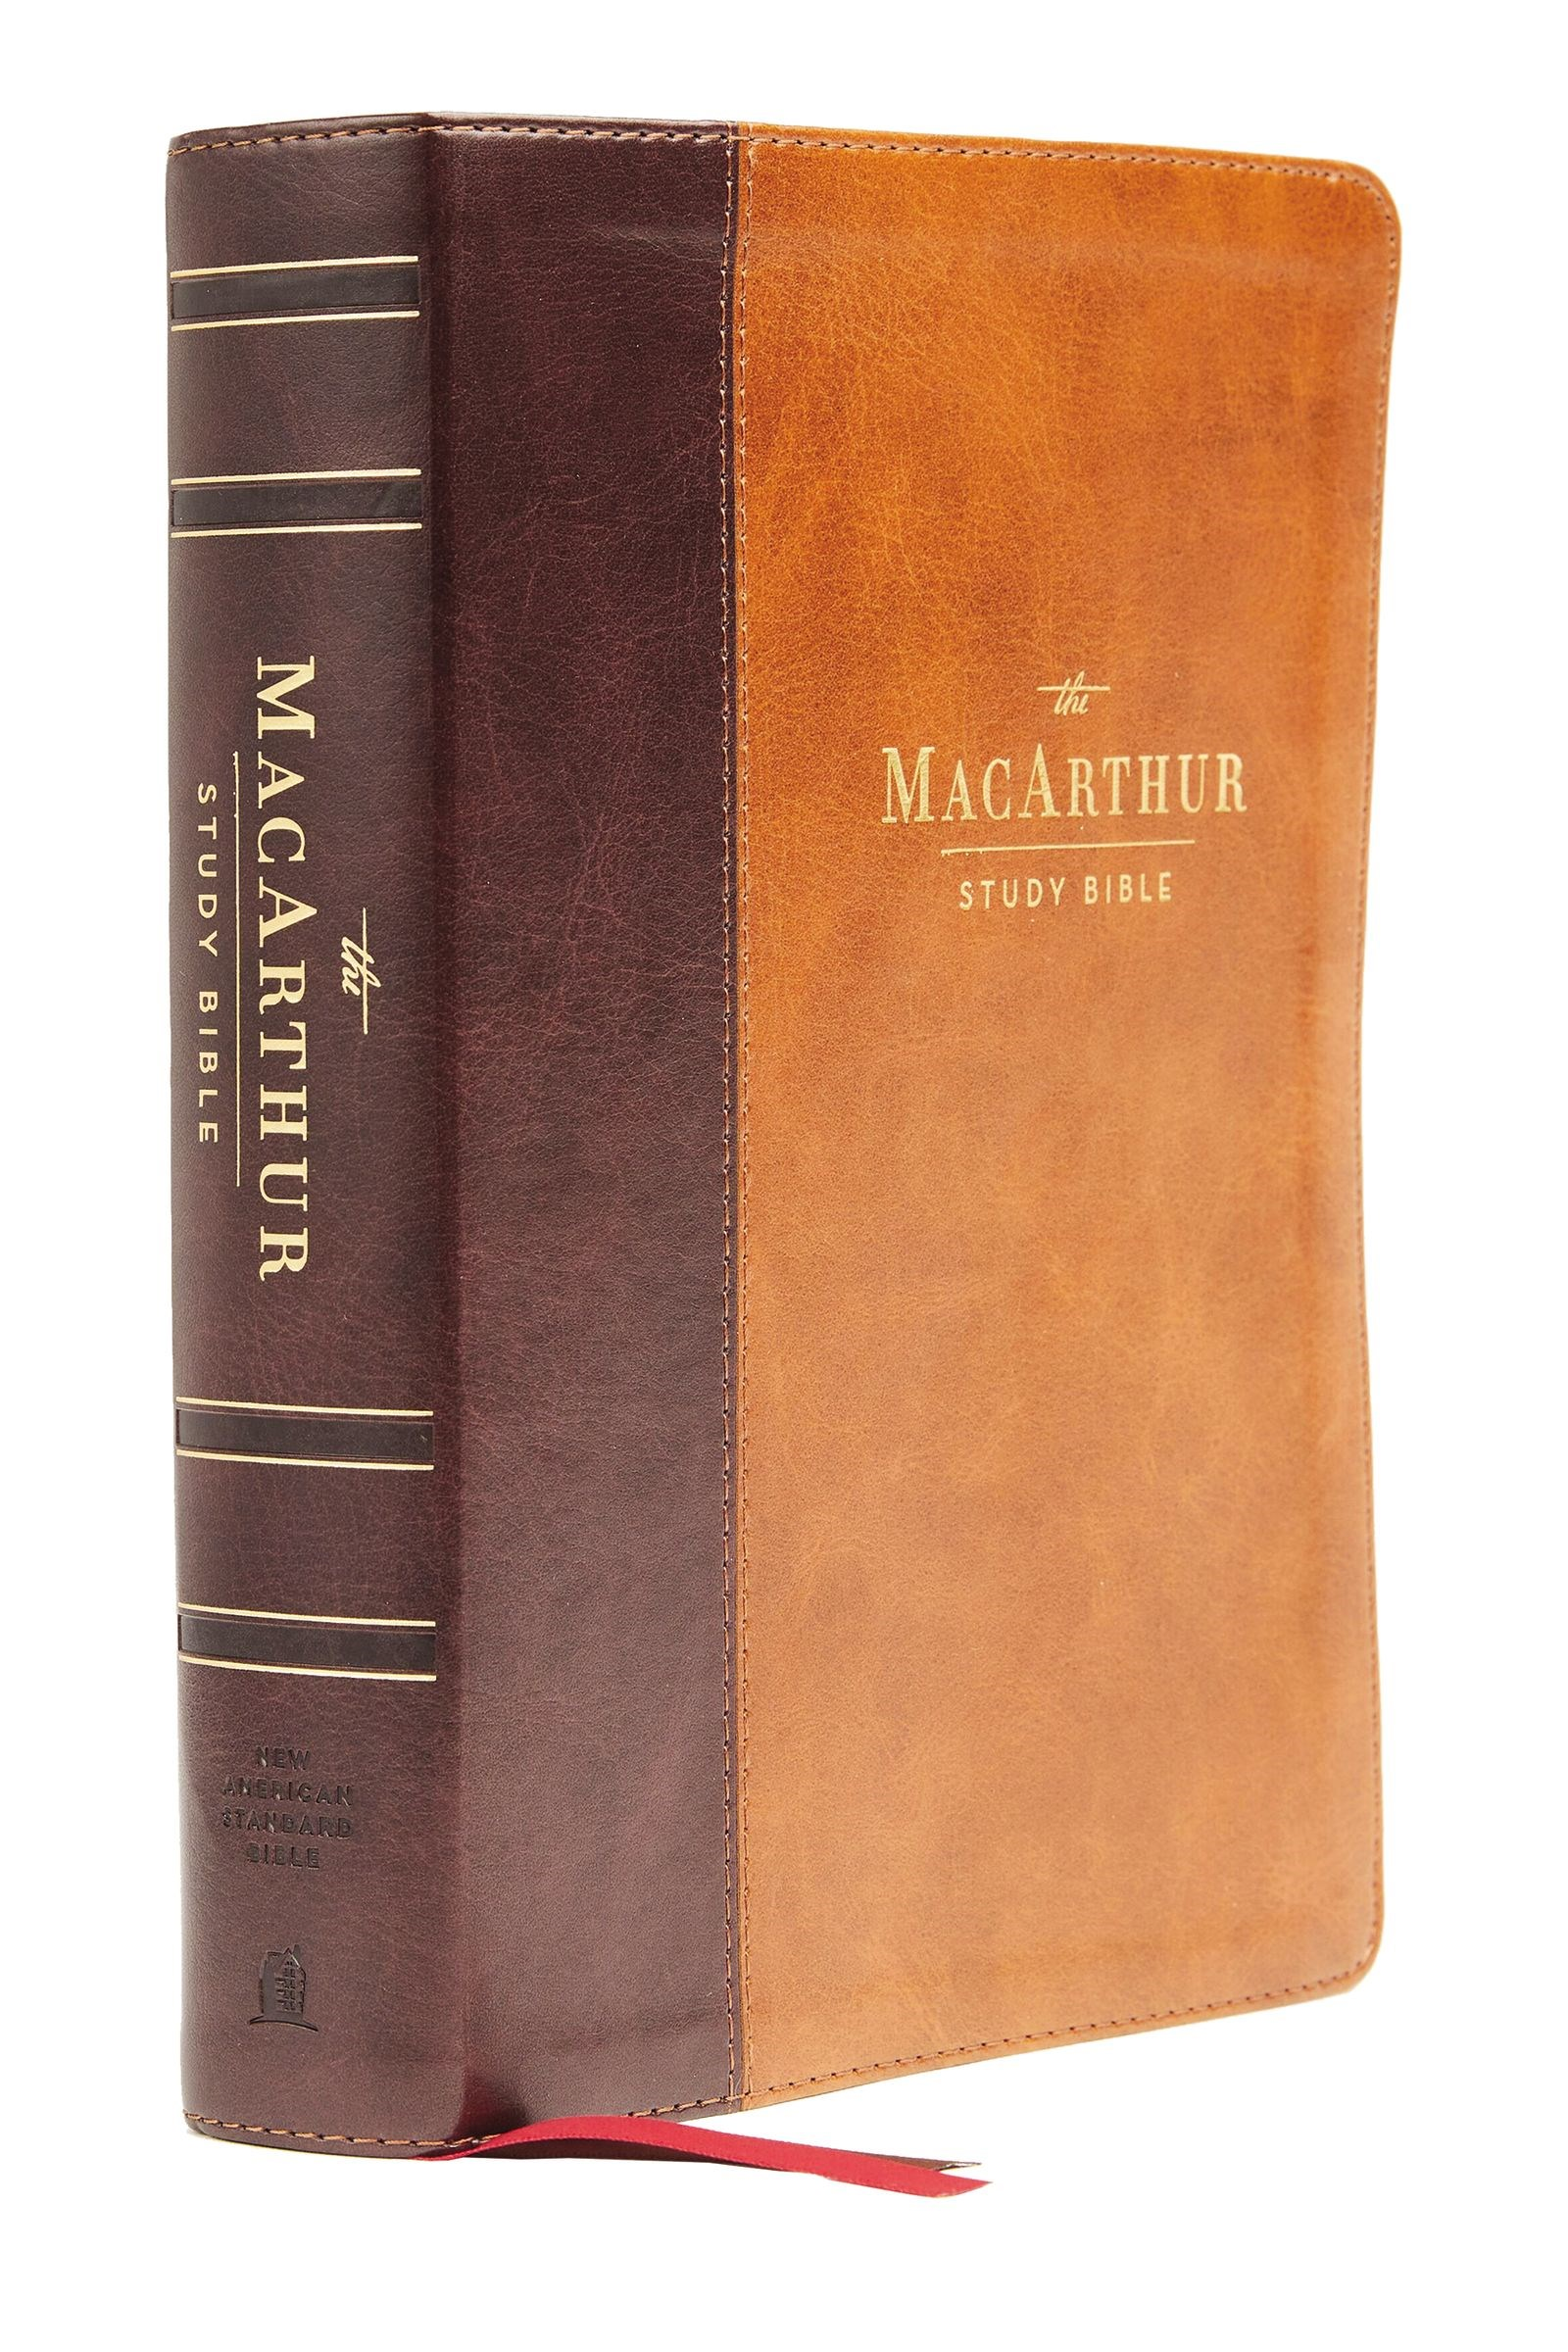 NASB MacArthur Study Bible (2nd Edition) (Comfort Print)-Mahogany Leathersoft Indexed